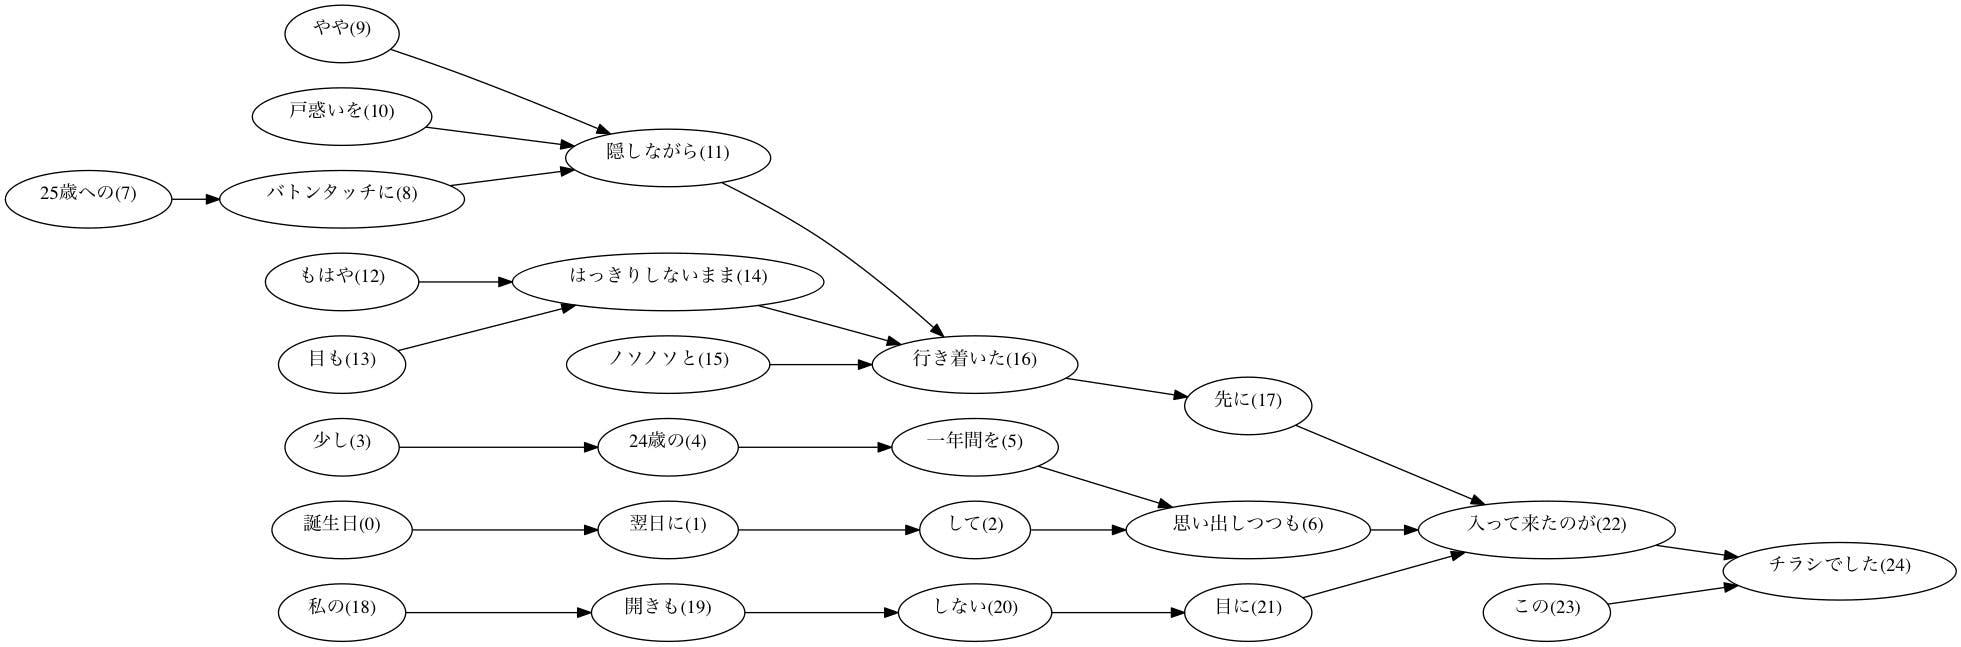 graph0.jpg